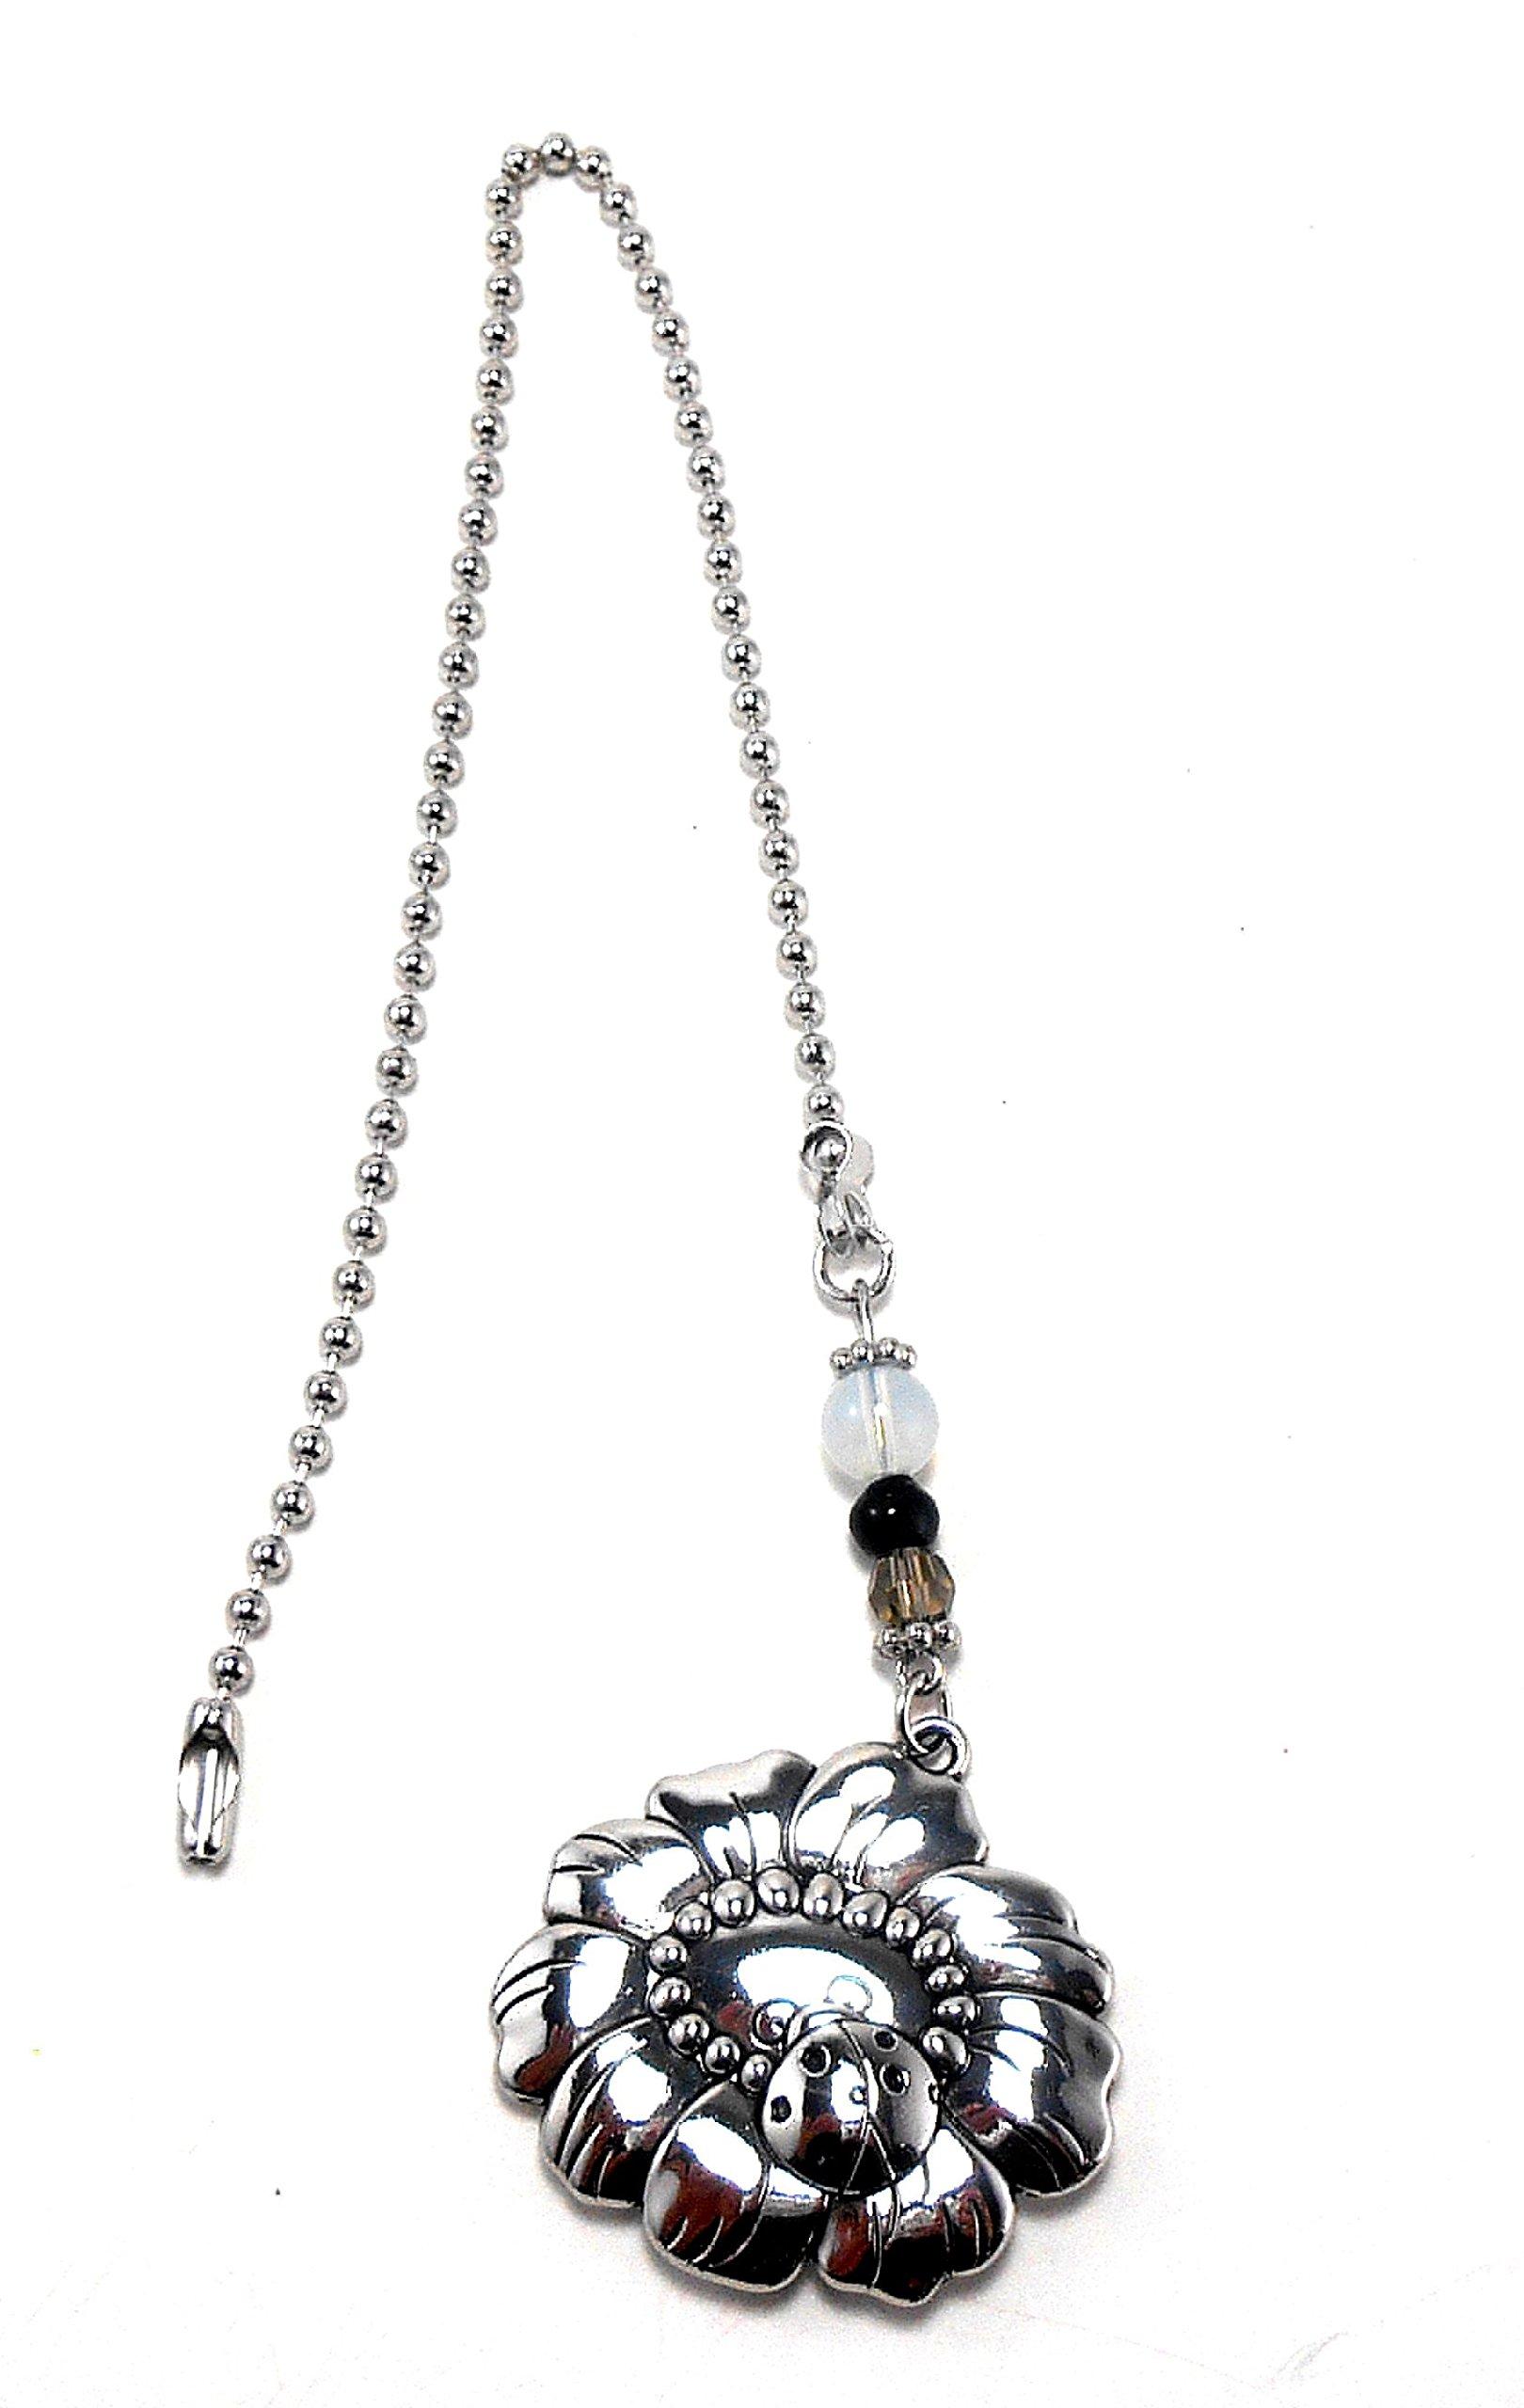 Silver Fan Pull From Ganz - Ladybug & Flower by Ganz (Image #1)